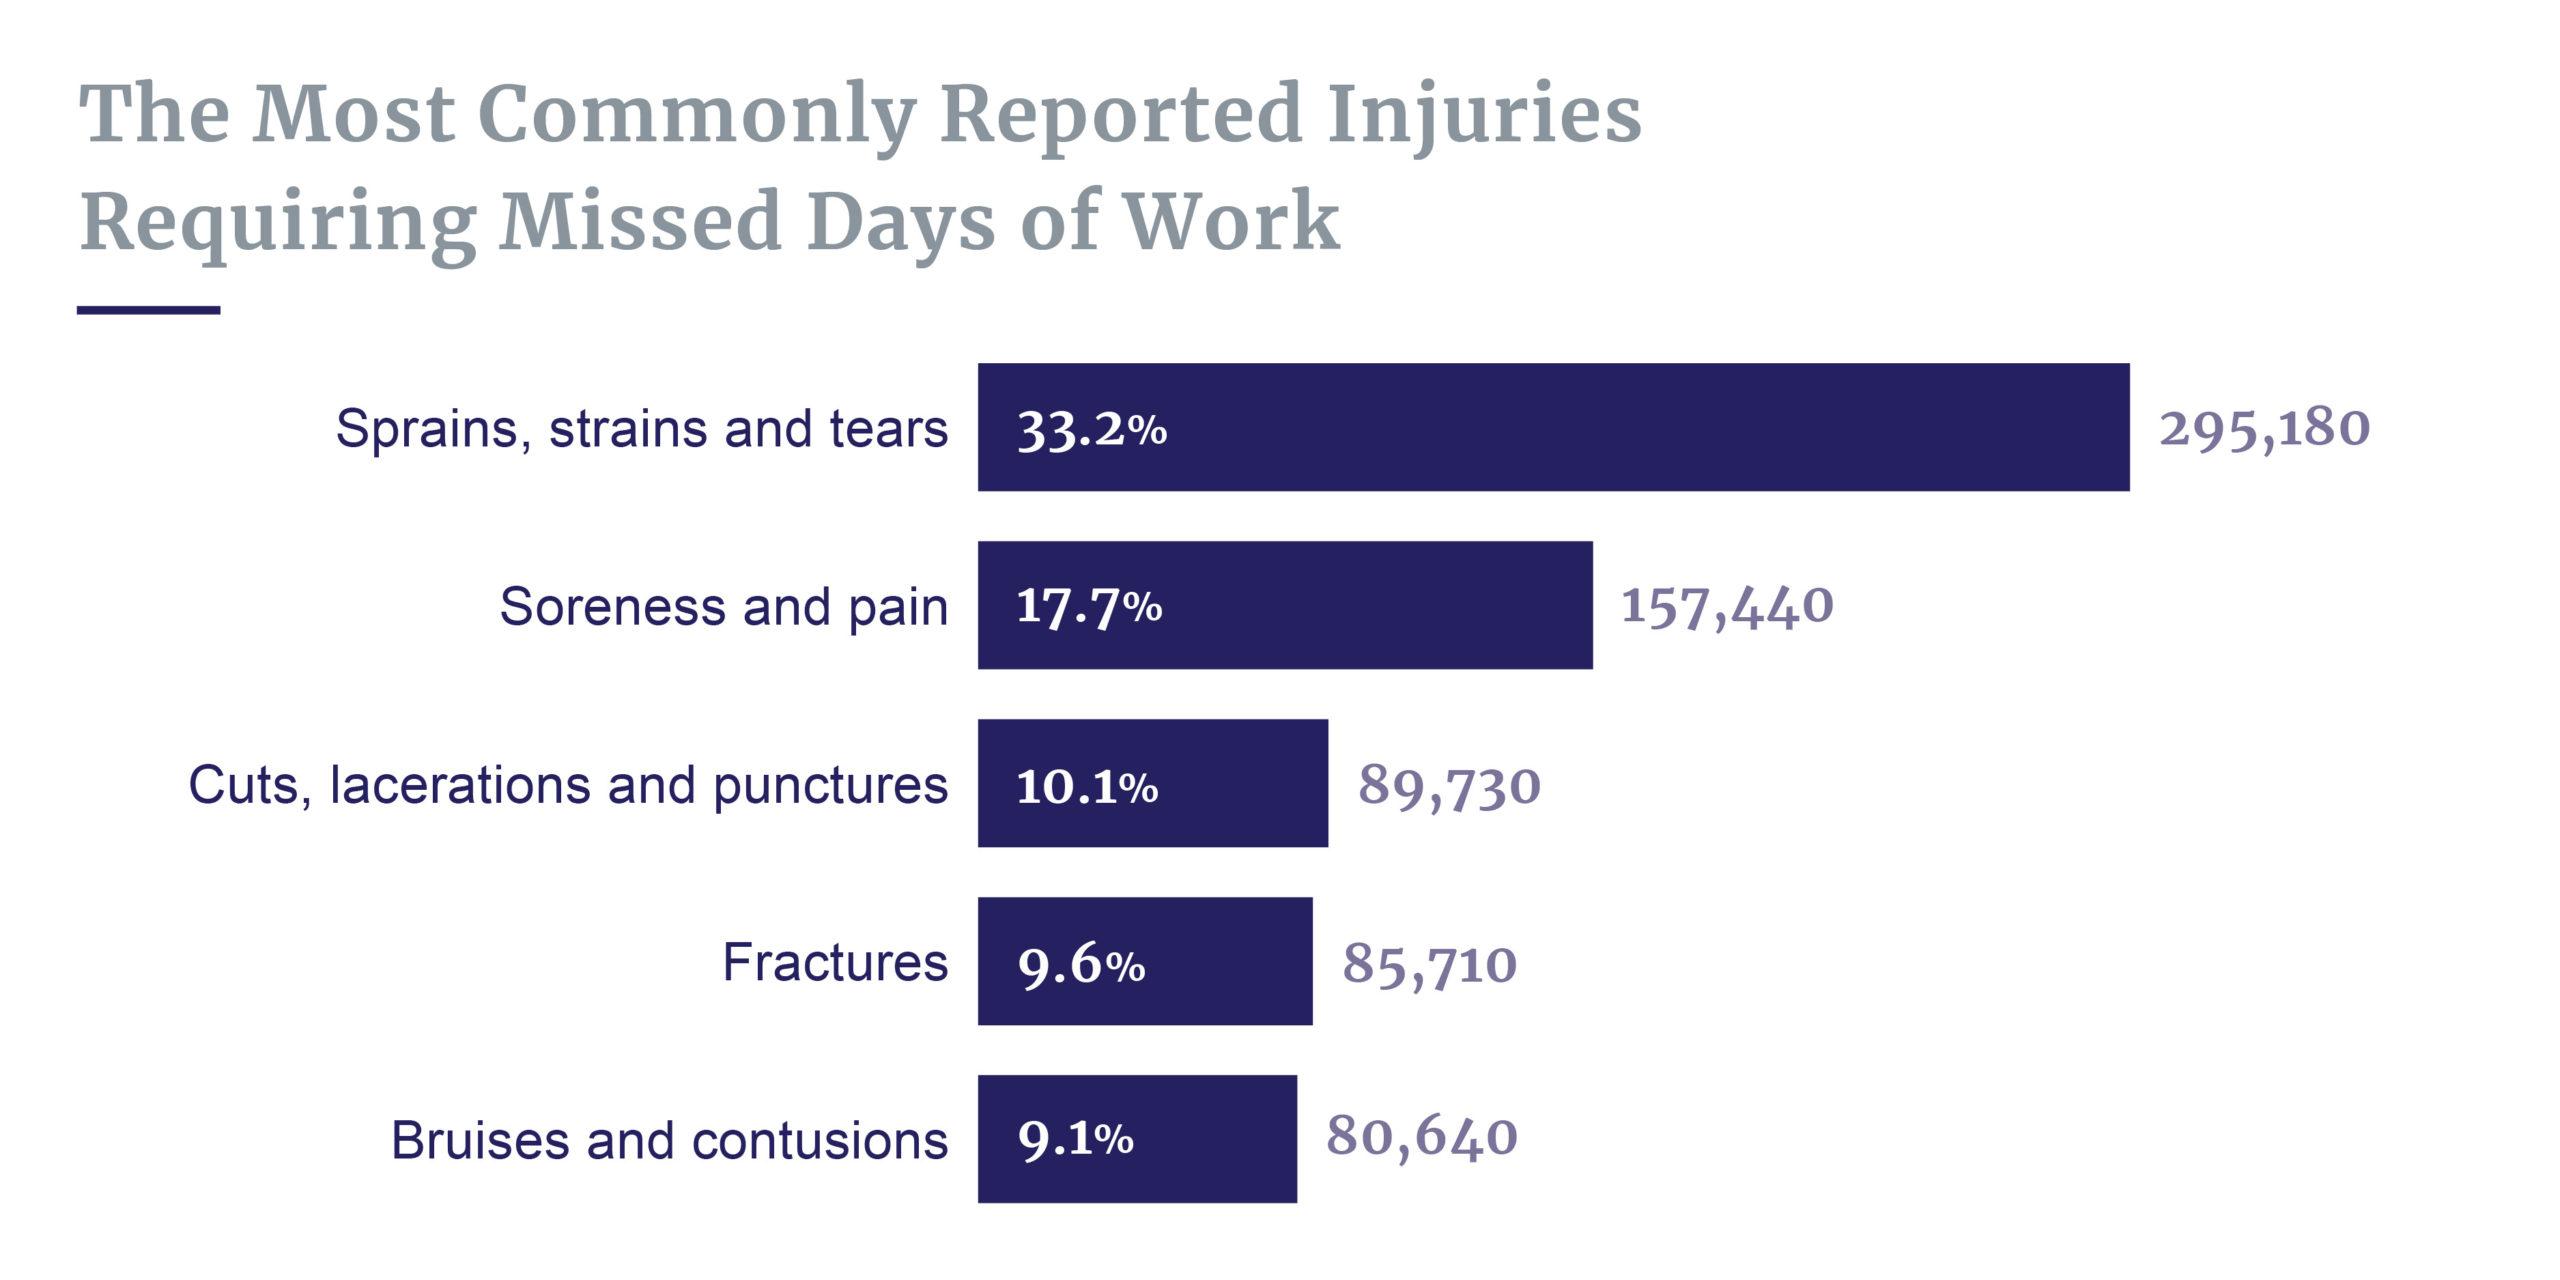 Injuries requiring missed days of work